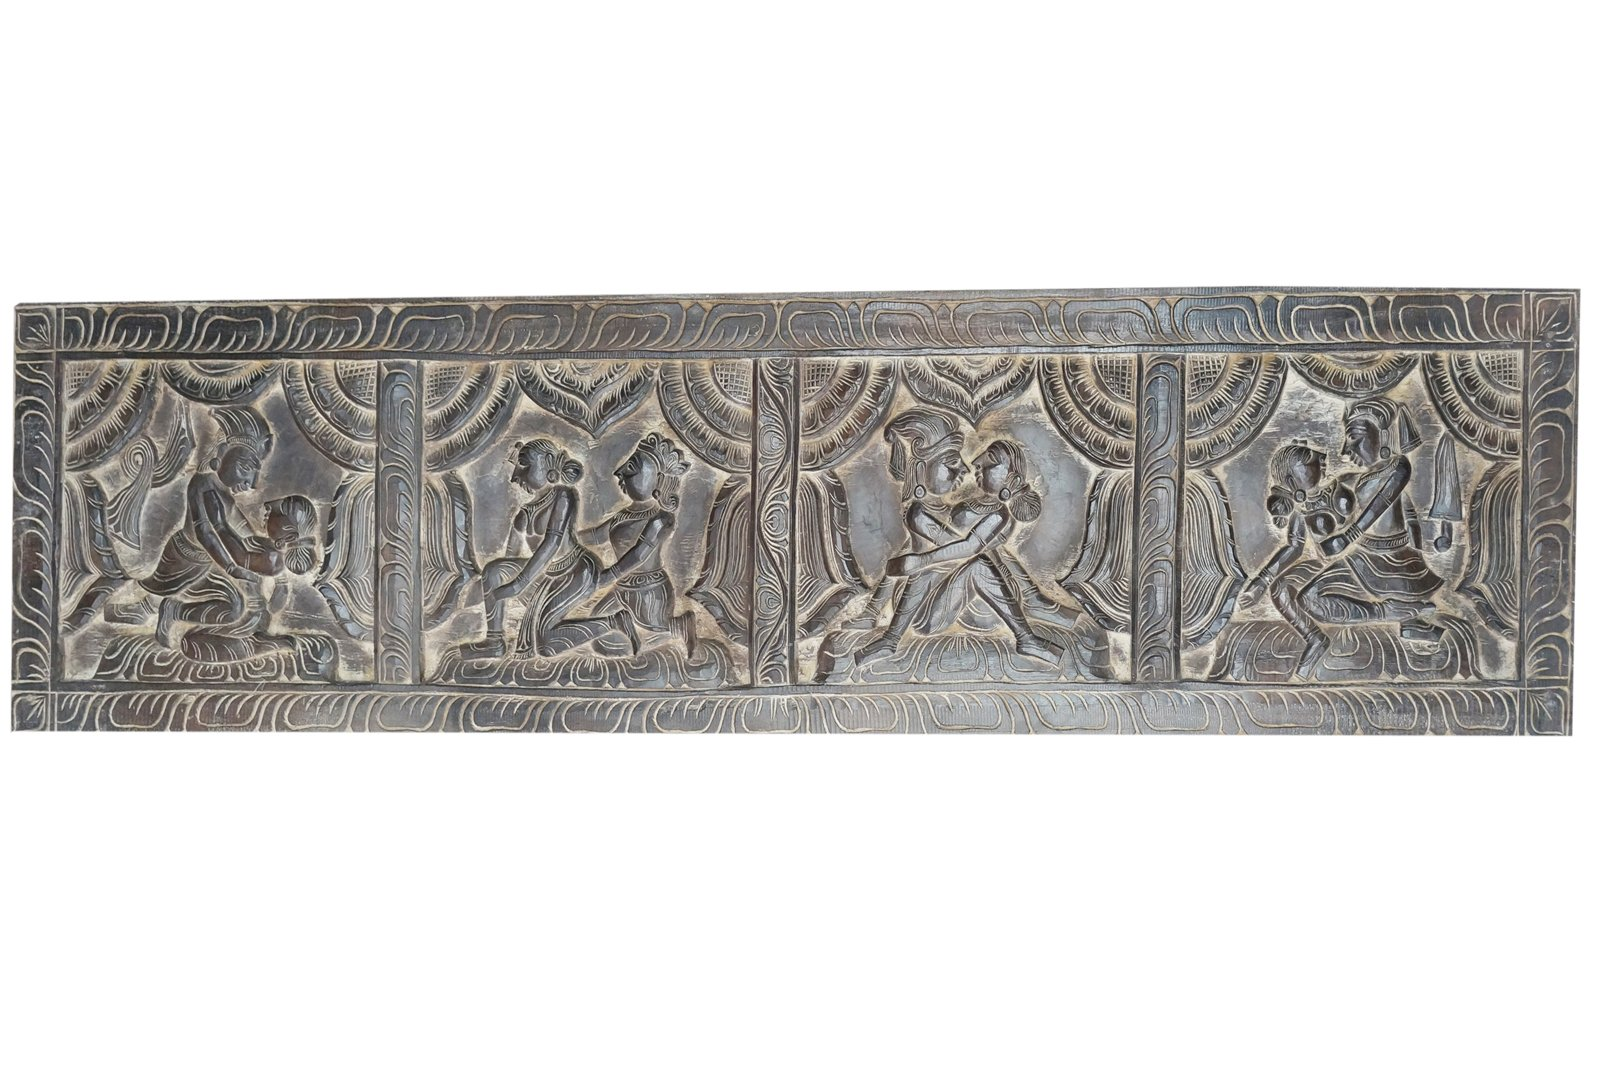 Antique Headboard Kamasutra Love Posture Wall Sculpture, Eclectic Decor, Wall Hanging